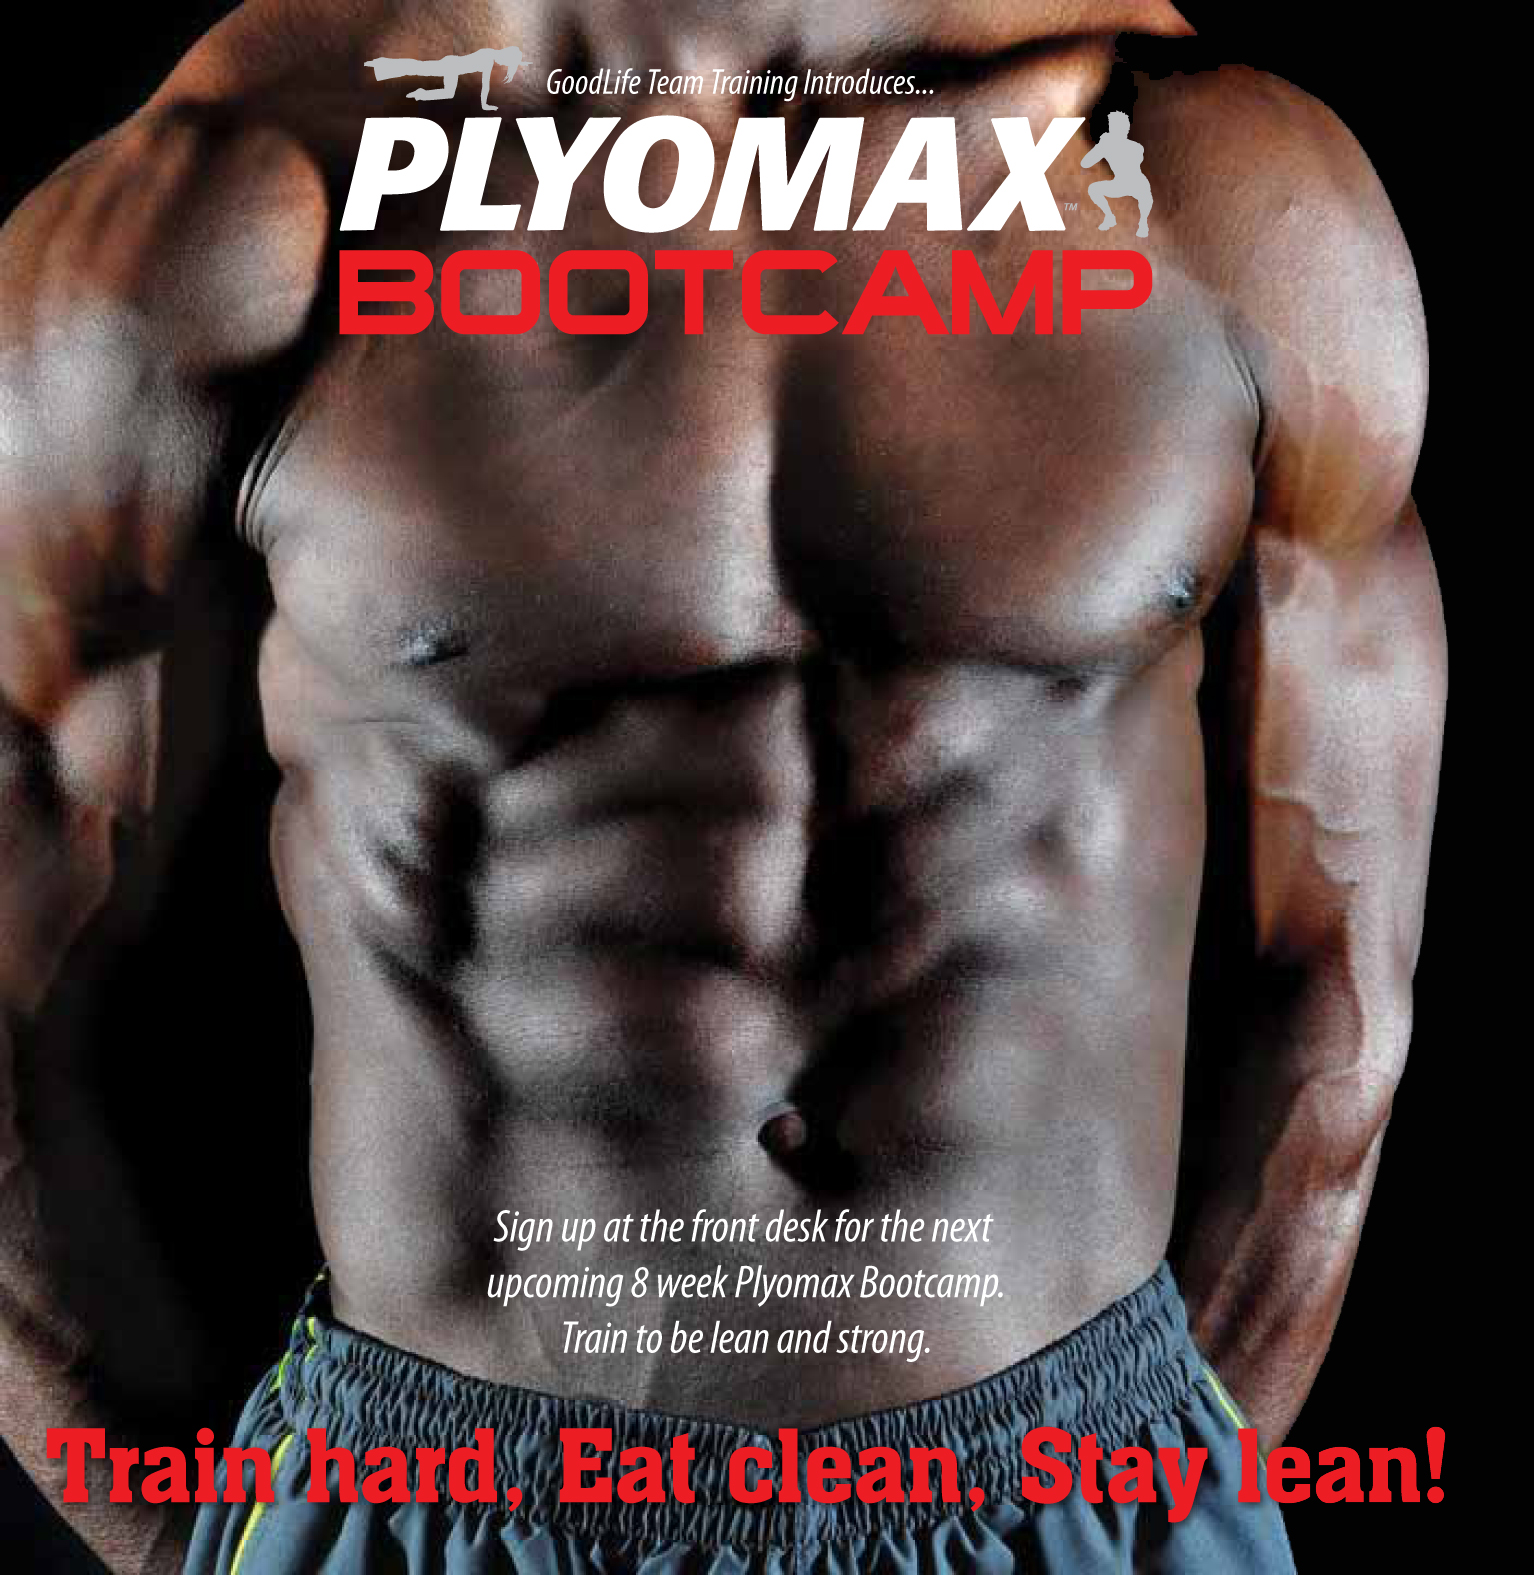 POSTER-Plyomax_Bootcamp_SimonAbs_Dec21 copy.JPG